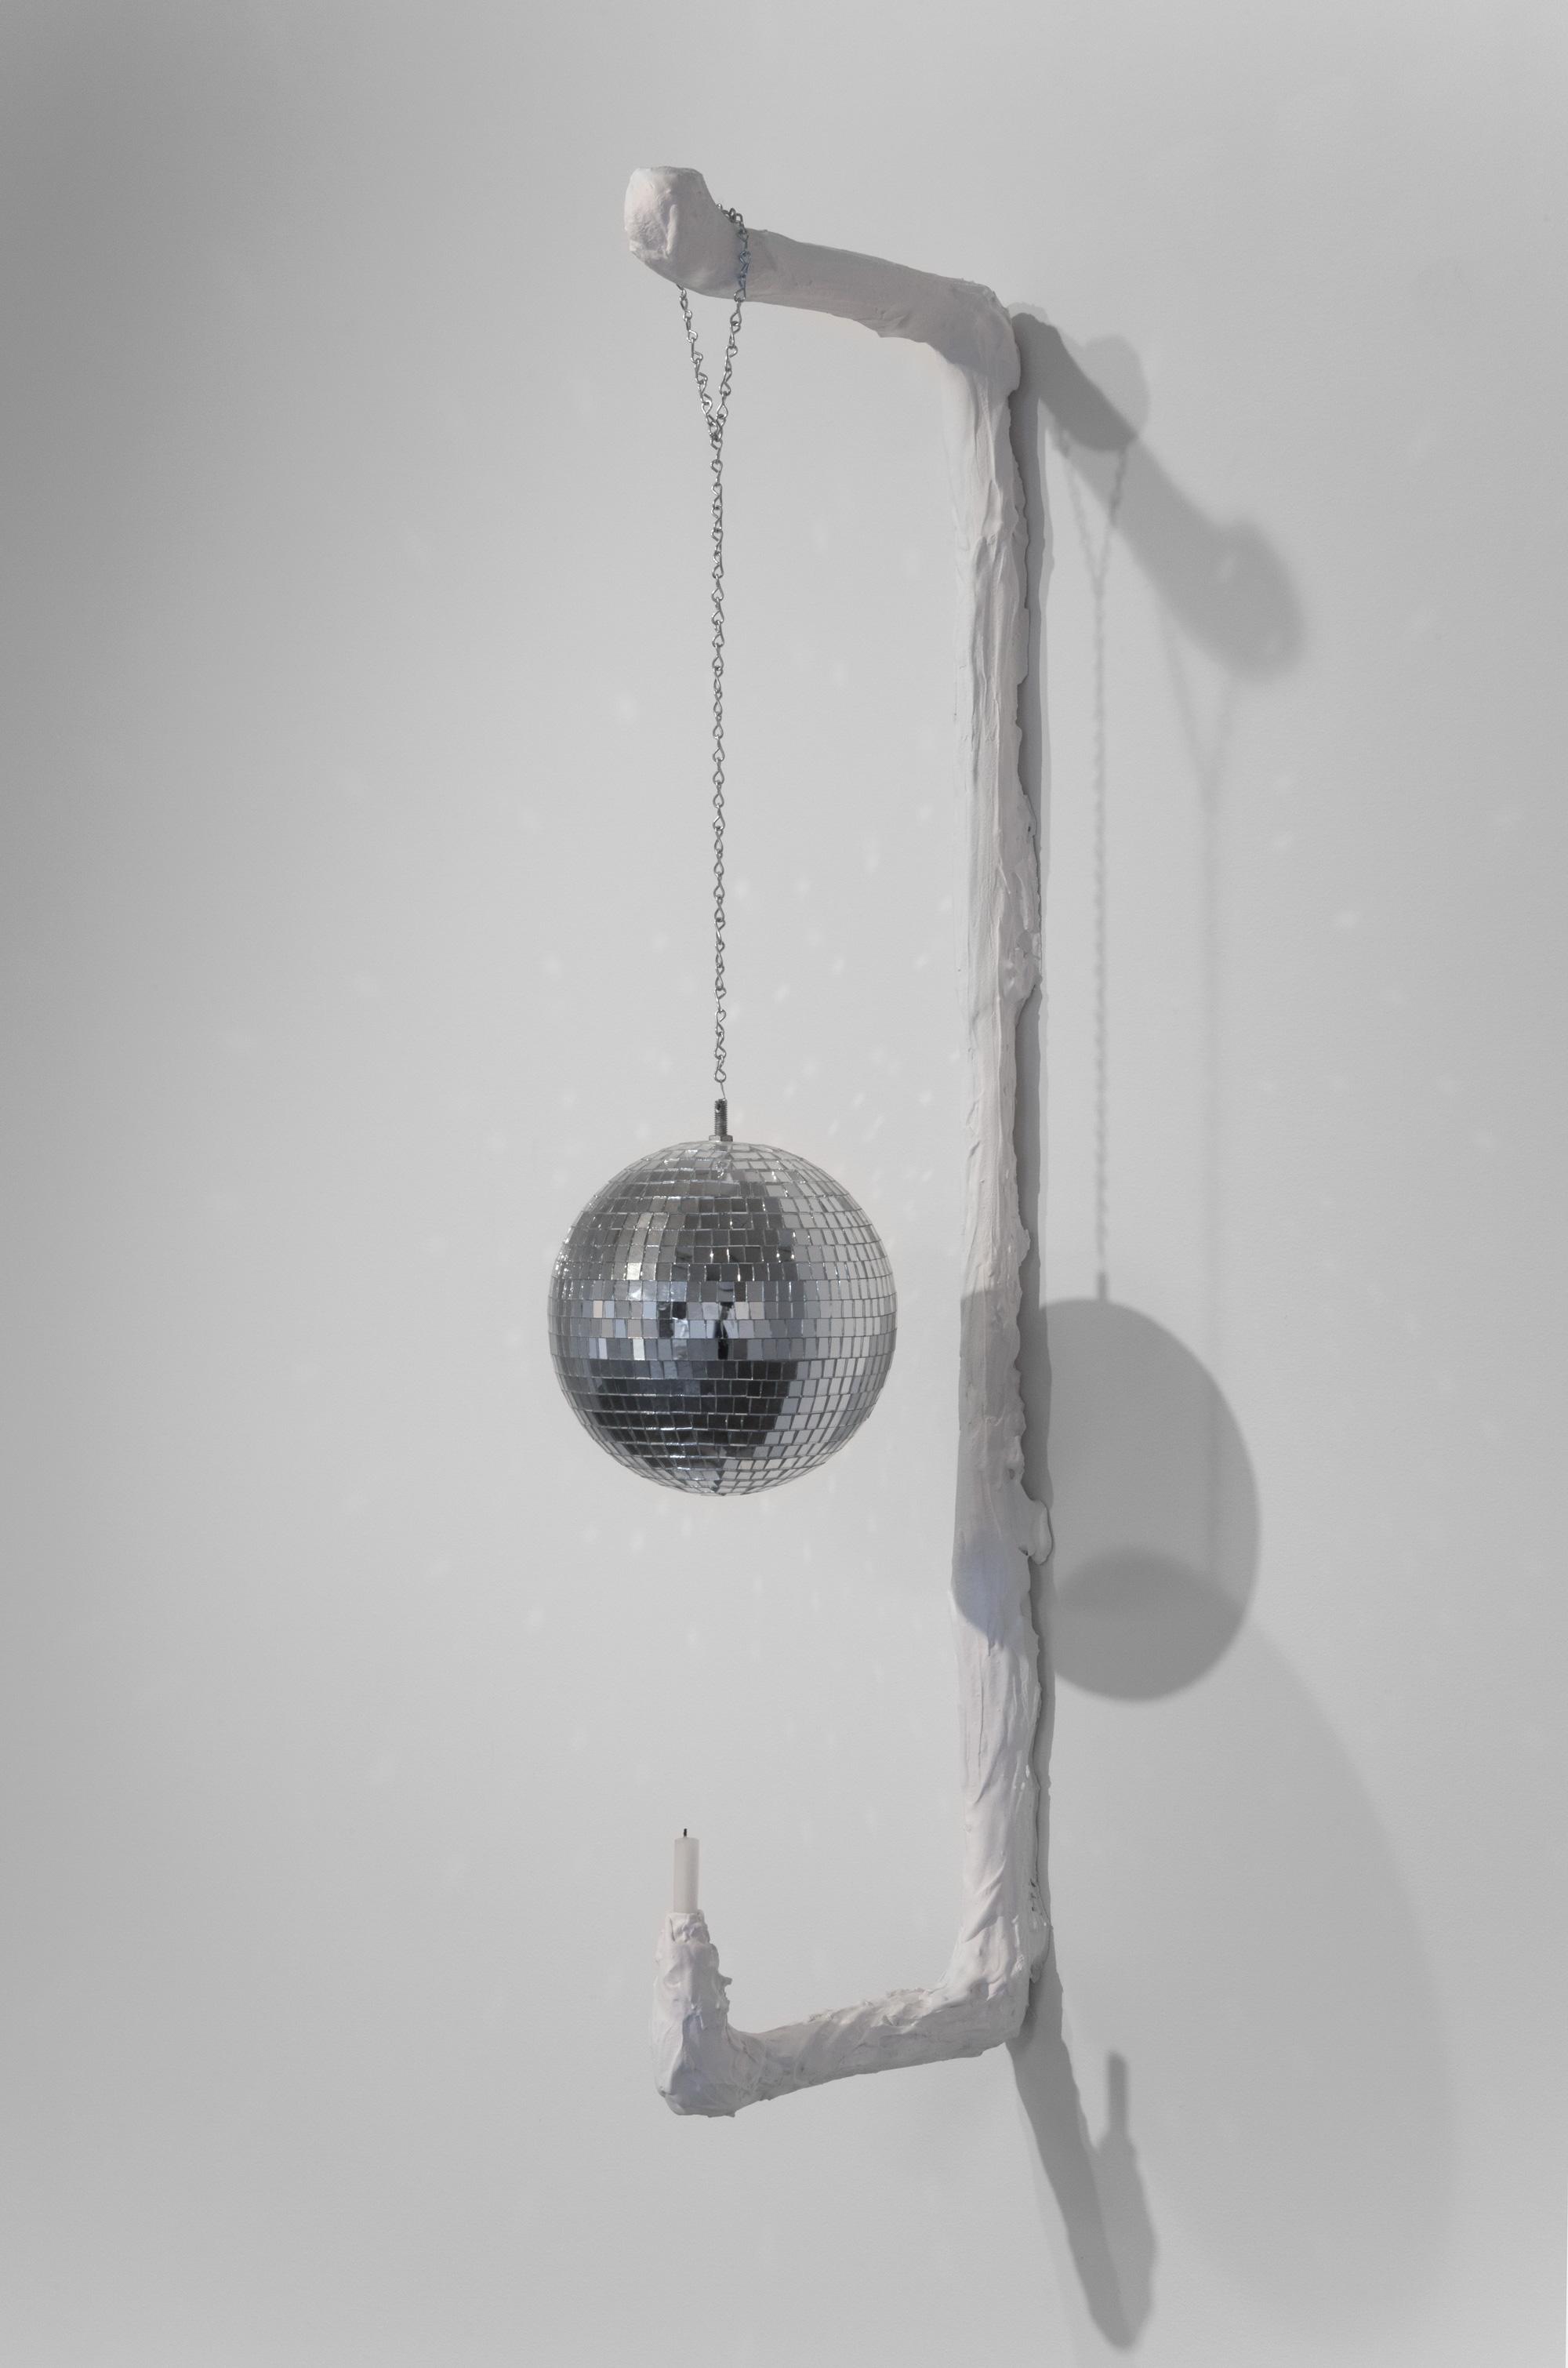 Kathryn O'Halloran,  Dance Scone , 2015, plaster, chain, disco ball